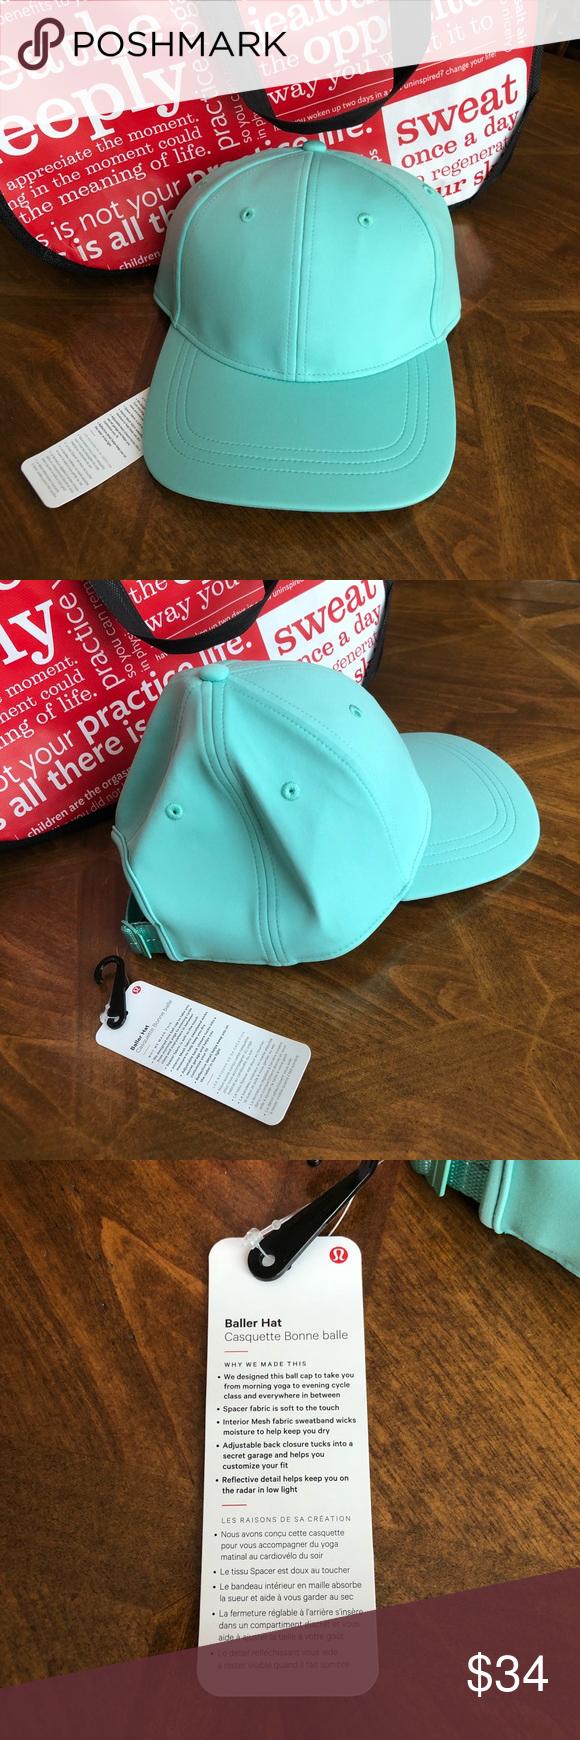 87d828fc Lululemon Baller Hat Such a beautiful color. Lulu Washed marsh! Blue/green  color